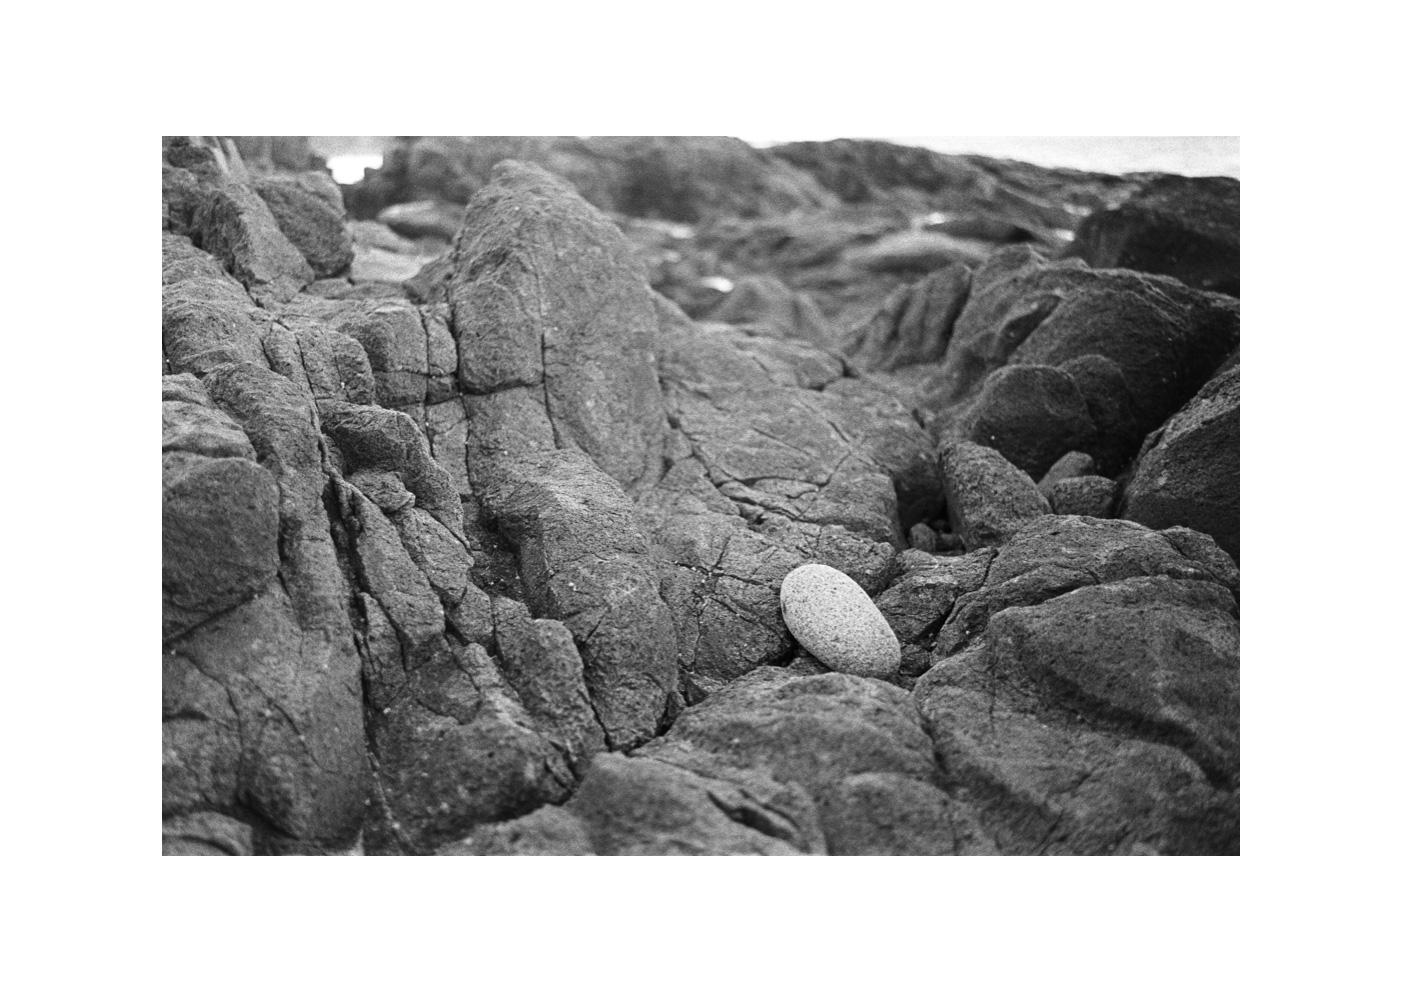 Lone Rock Resting, Coolum